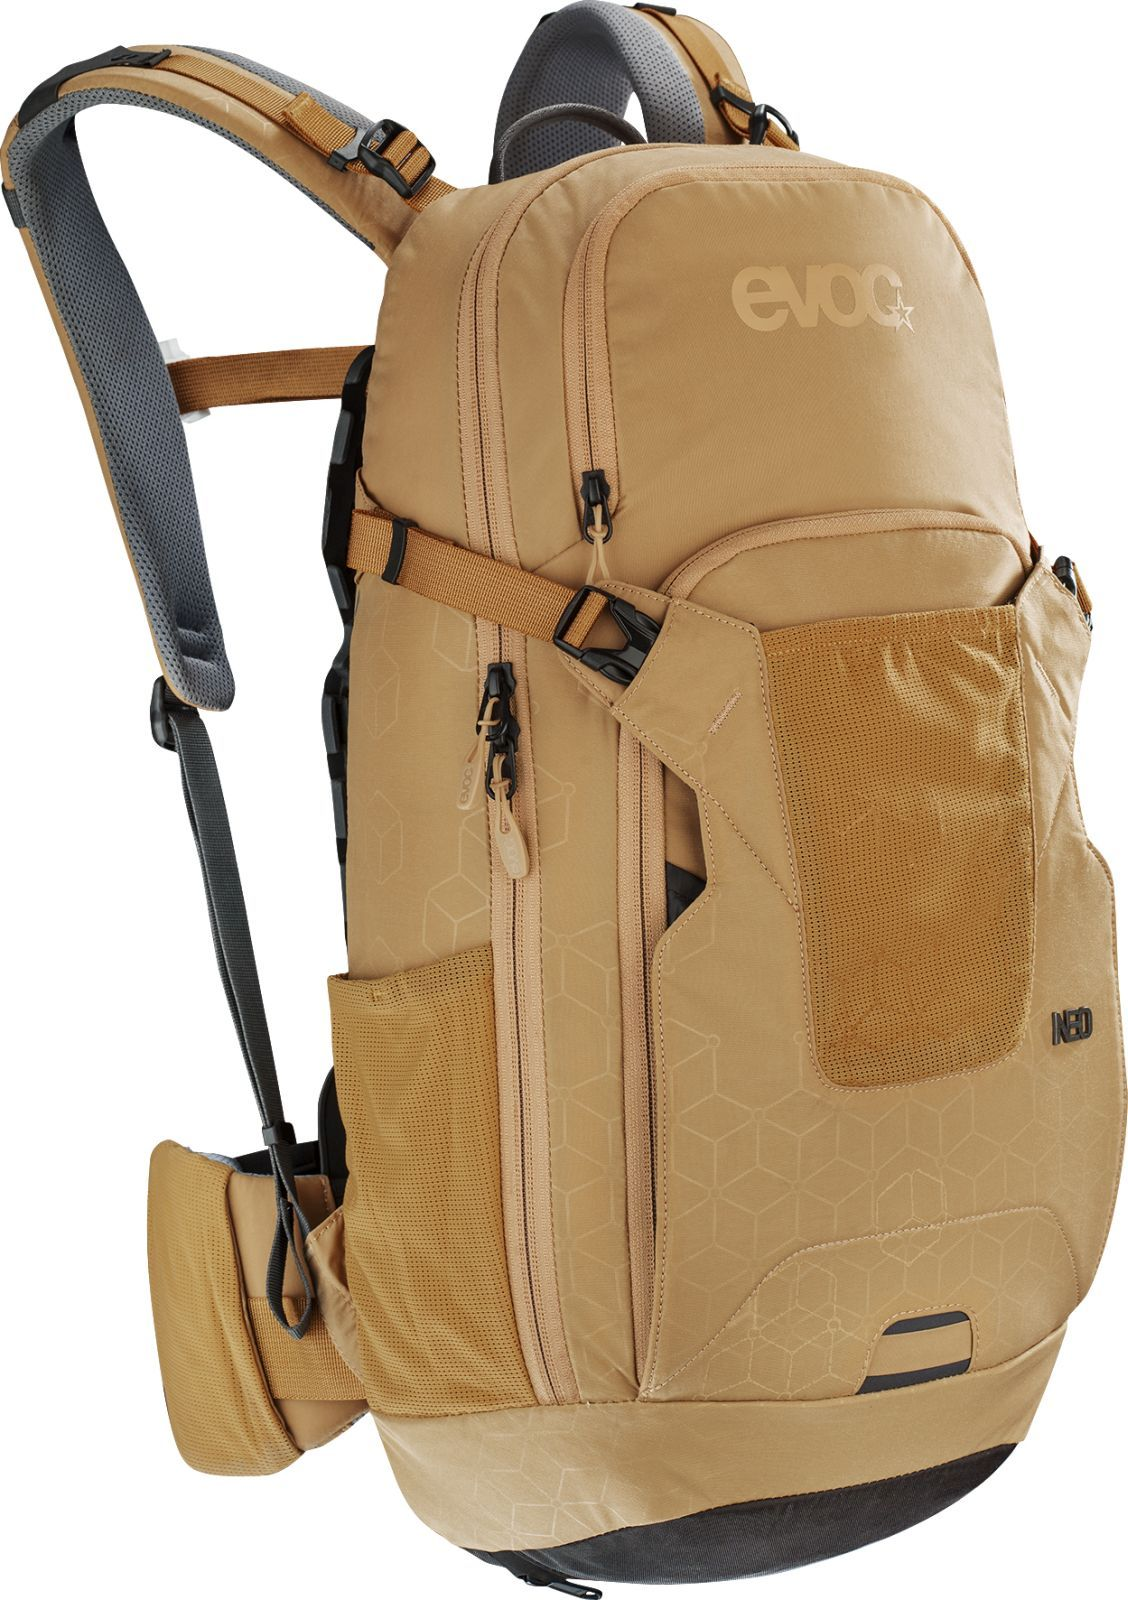 Evoc Neo 16L - gold L/XL